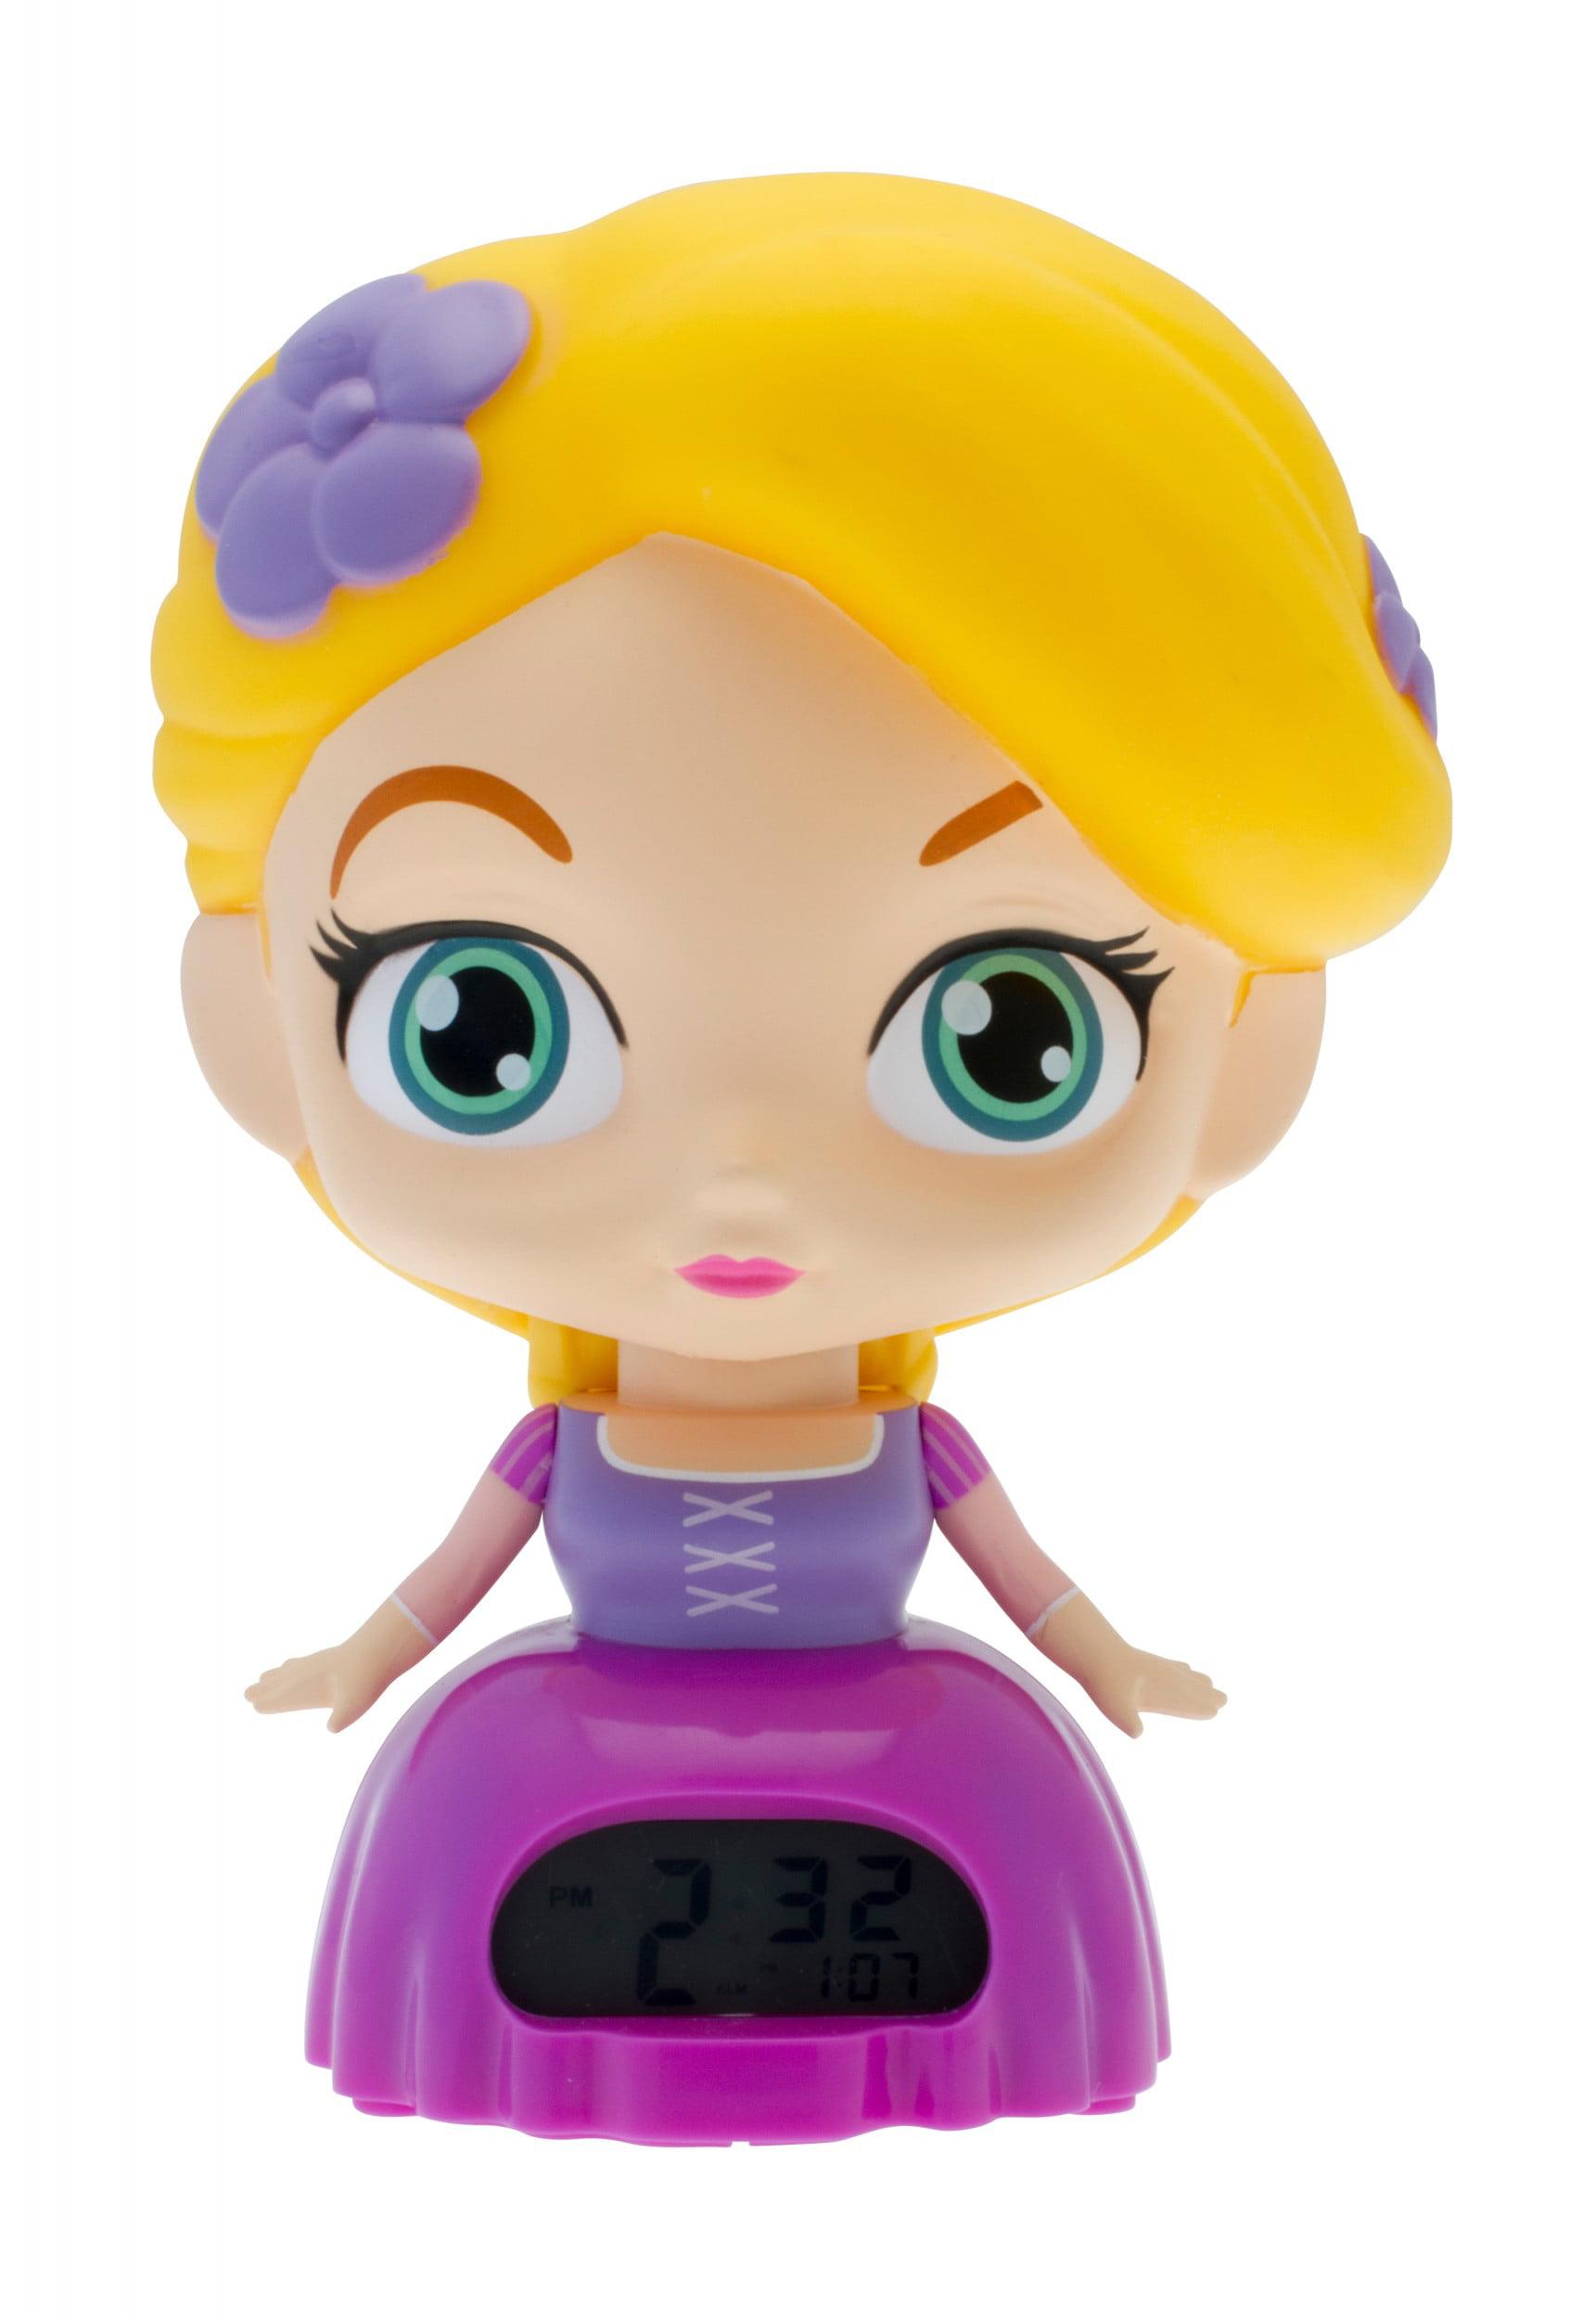 "BulbBotz Disney Princess Rapunzel 7.5"" clock by ClicTime"